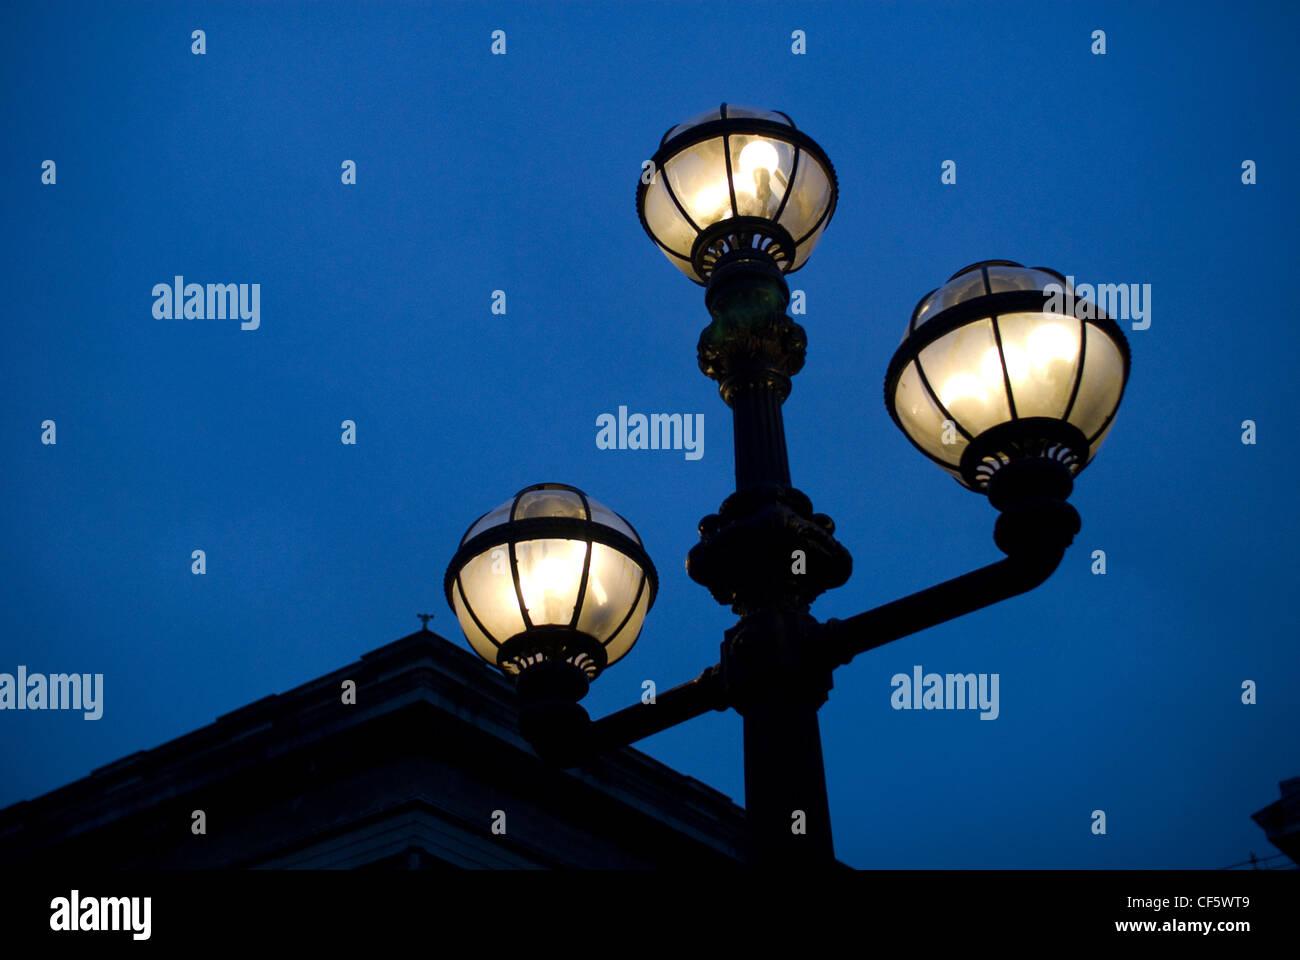 An illuminated street light outside the British Museum at night. - Stock Image